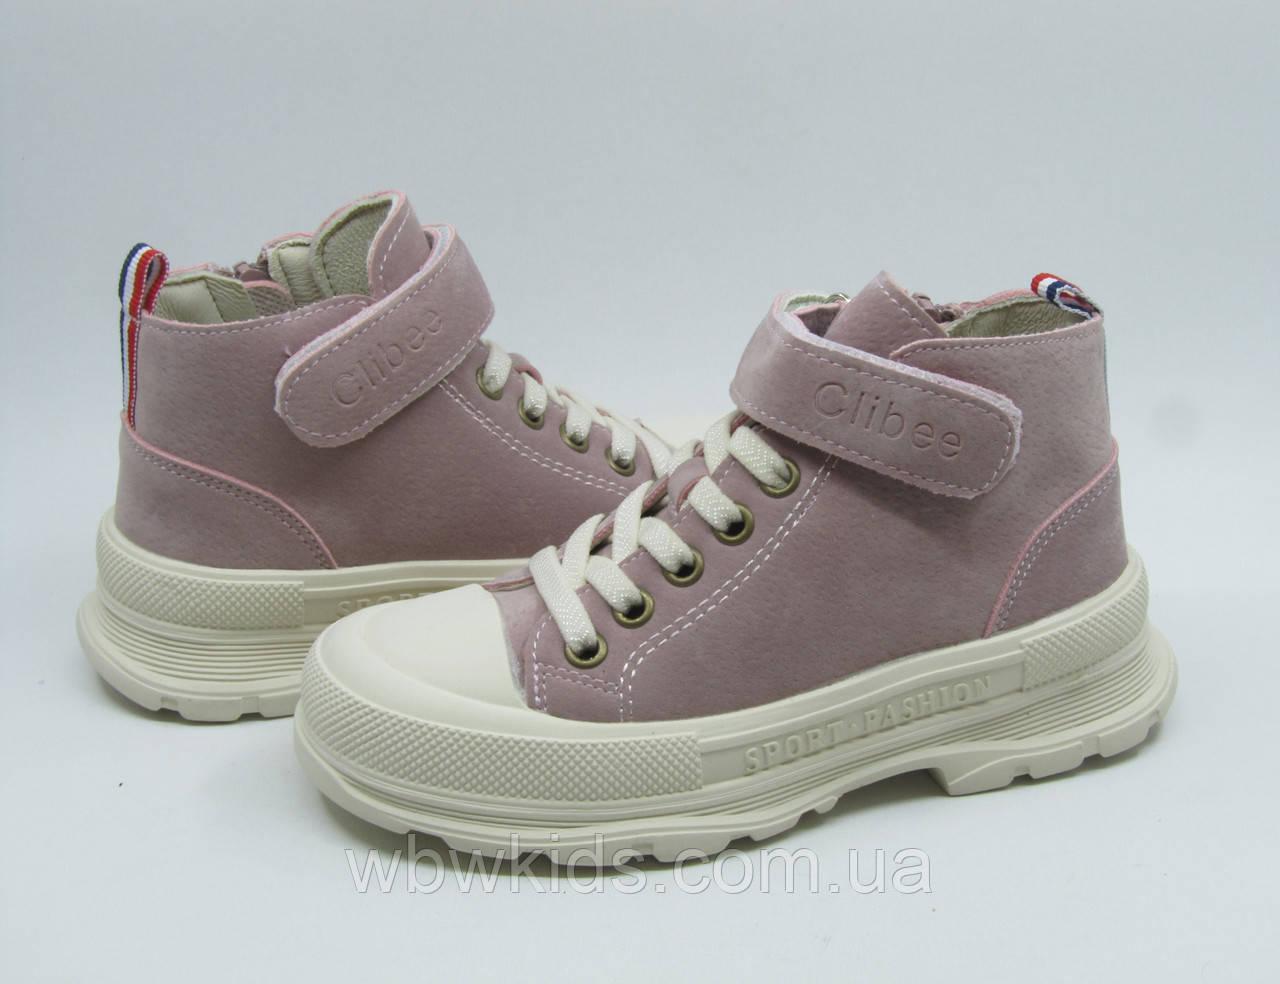 Ботинки детские Clibee P700 pink для девочки 28